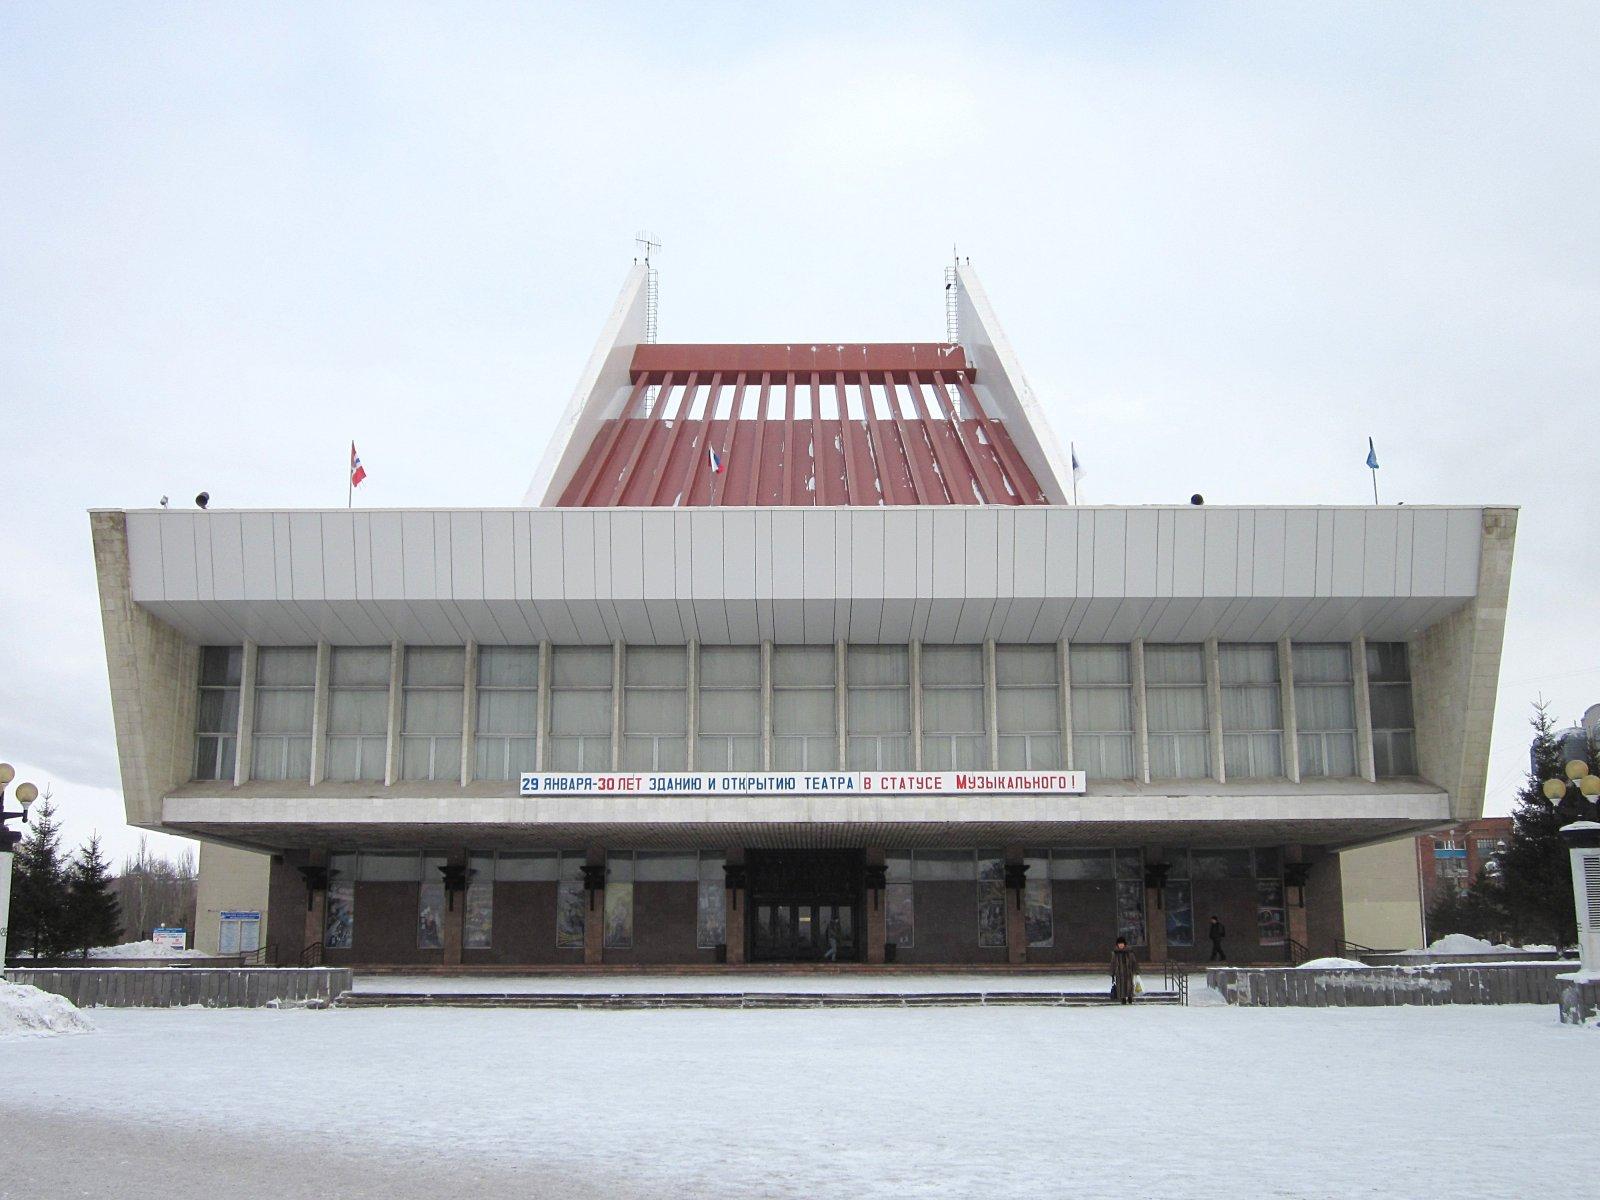 тому картинка омский муз театр лицо квадратное, объёмное